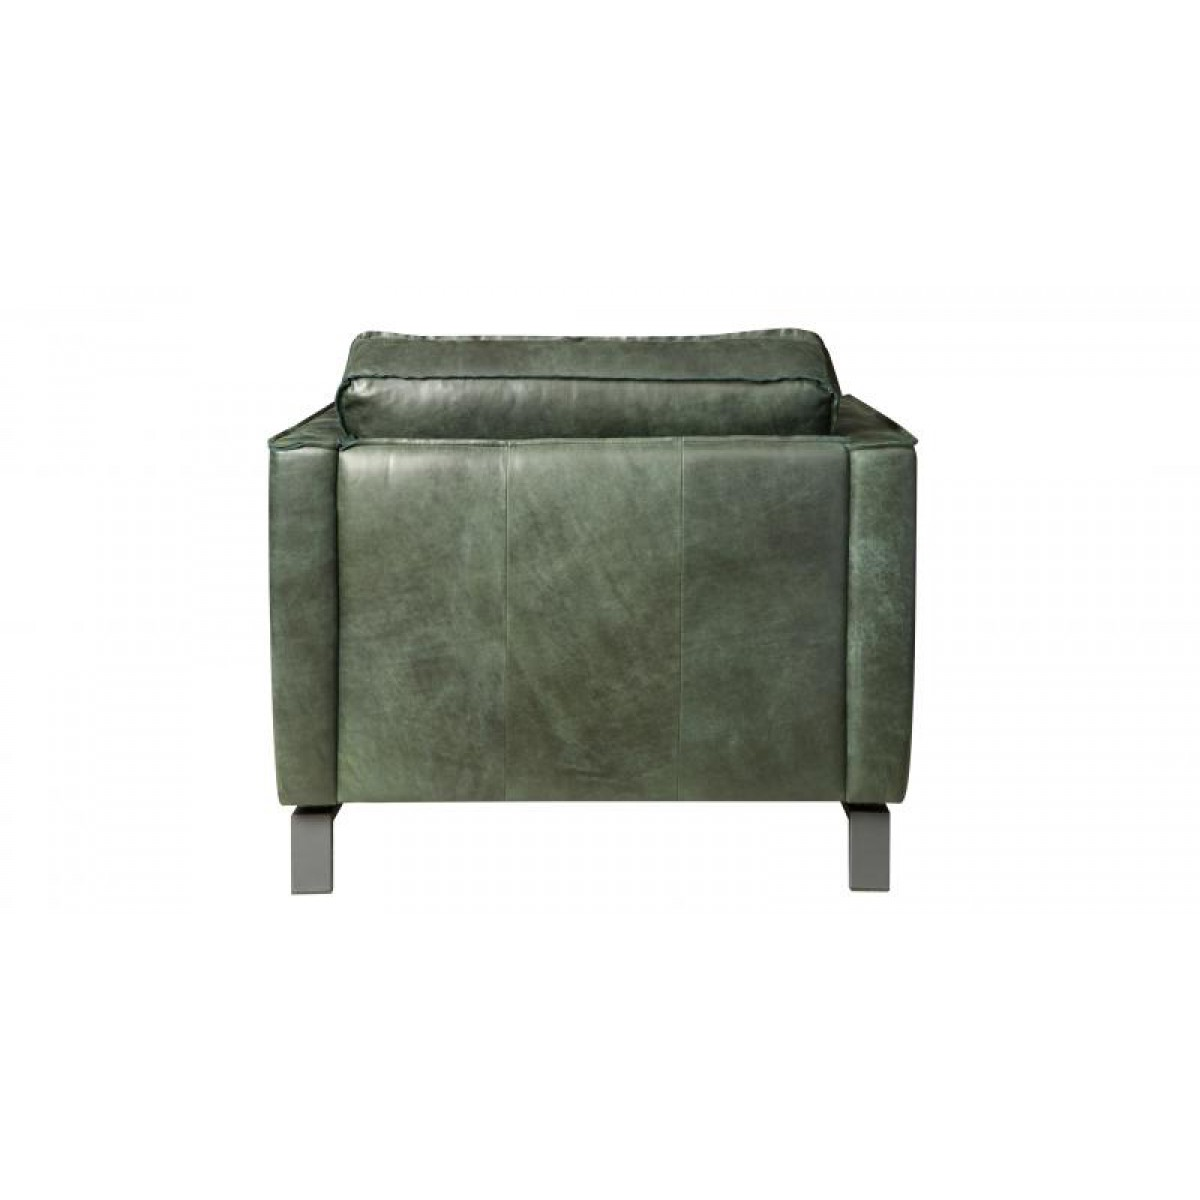 havanna-fauteuil-loveseat-leer-leder-het-anker-l'ancora-achter